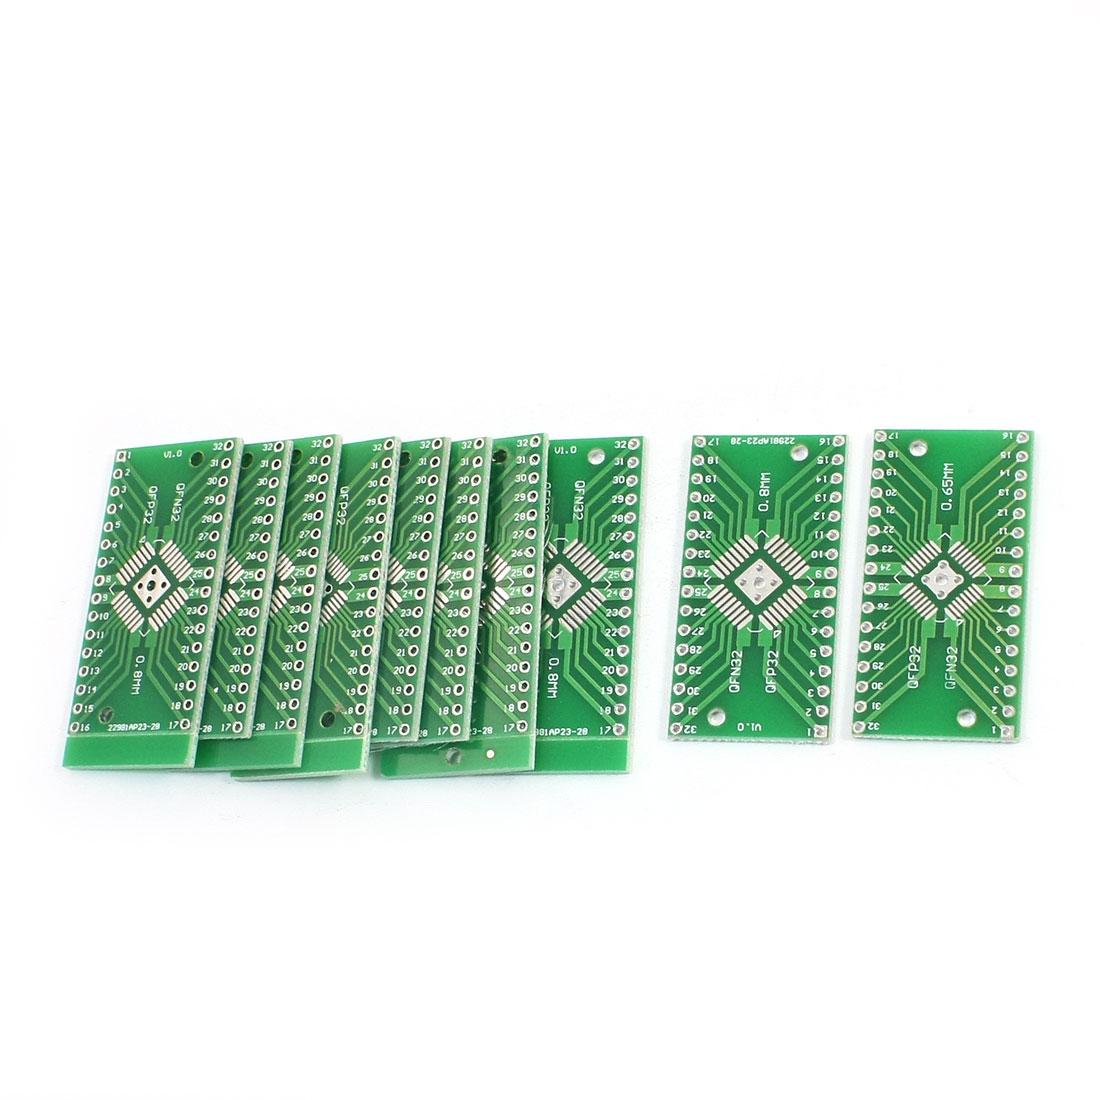 10pcs SMD QFN32 QFP32 0.8mm 0.65mm DIP32 PCB Adapter Converter Plates